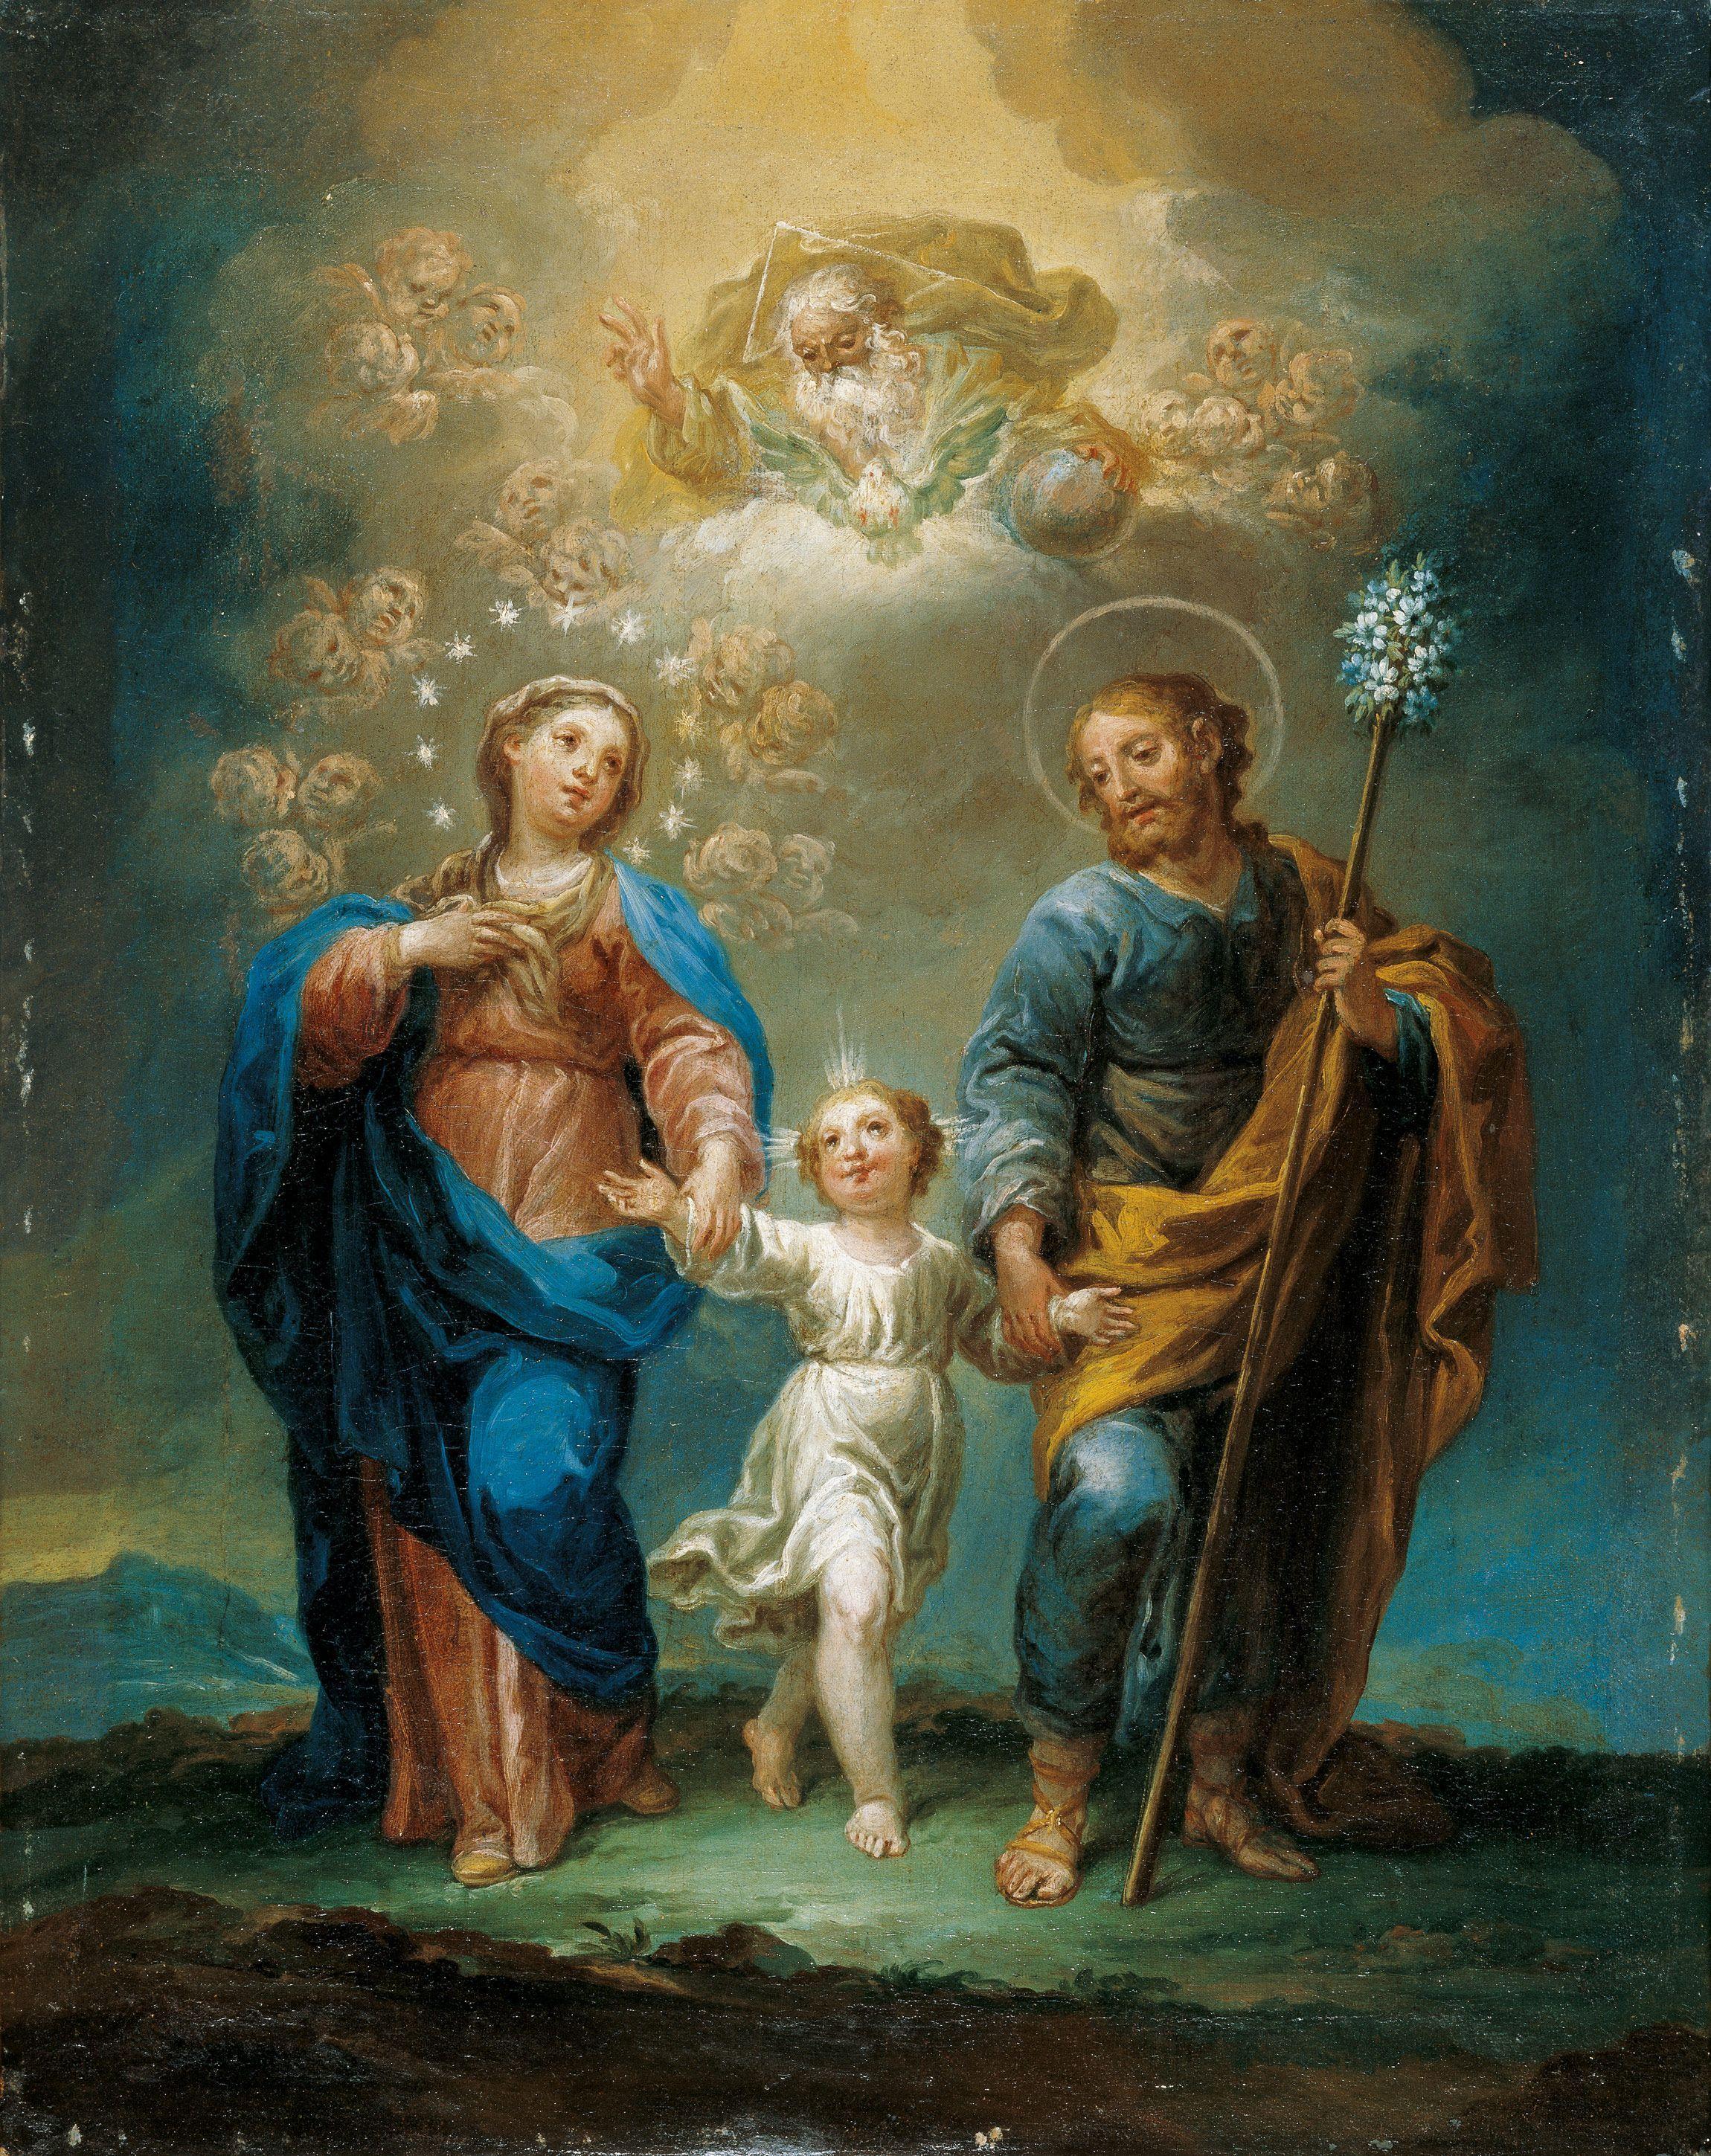 6225feba31f8b46ebe180302c667eaa9 Jpg Jpeg Image 2300 2899 Pixels Scaled 28 Sagrada Familia De Nazareth Imágenes Religiosas Figuras Religiosas